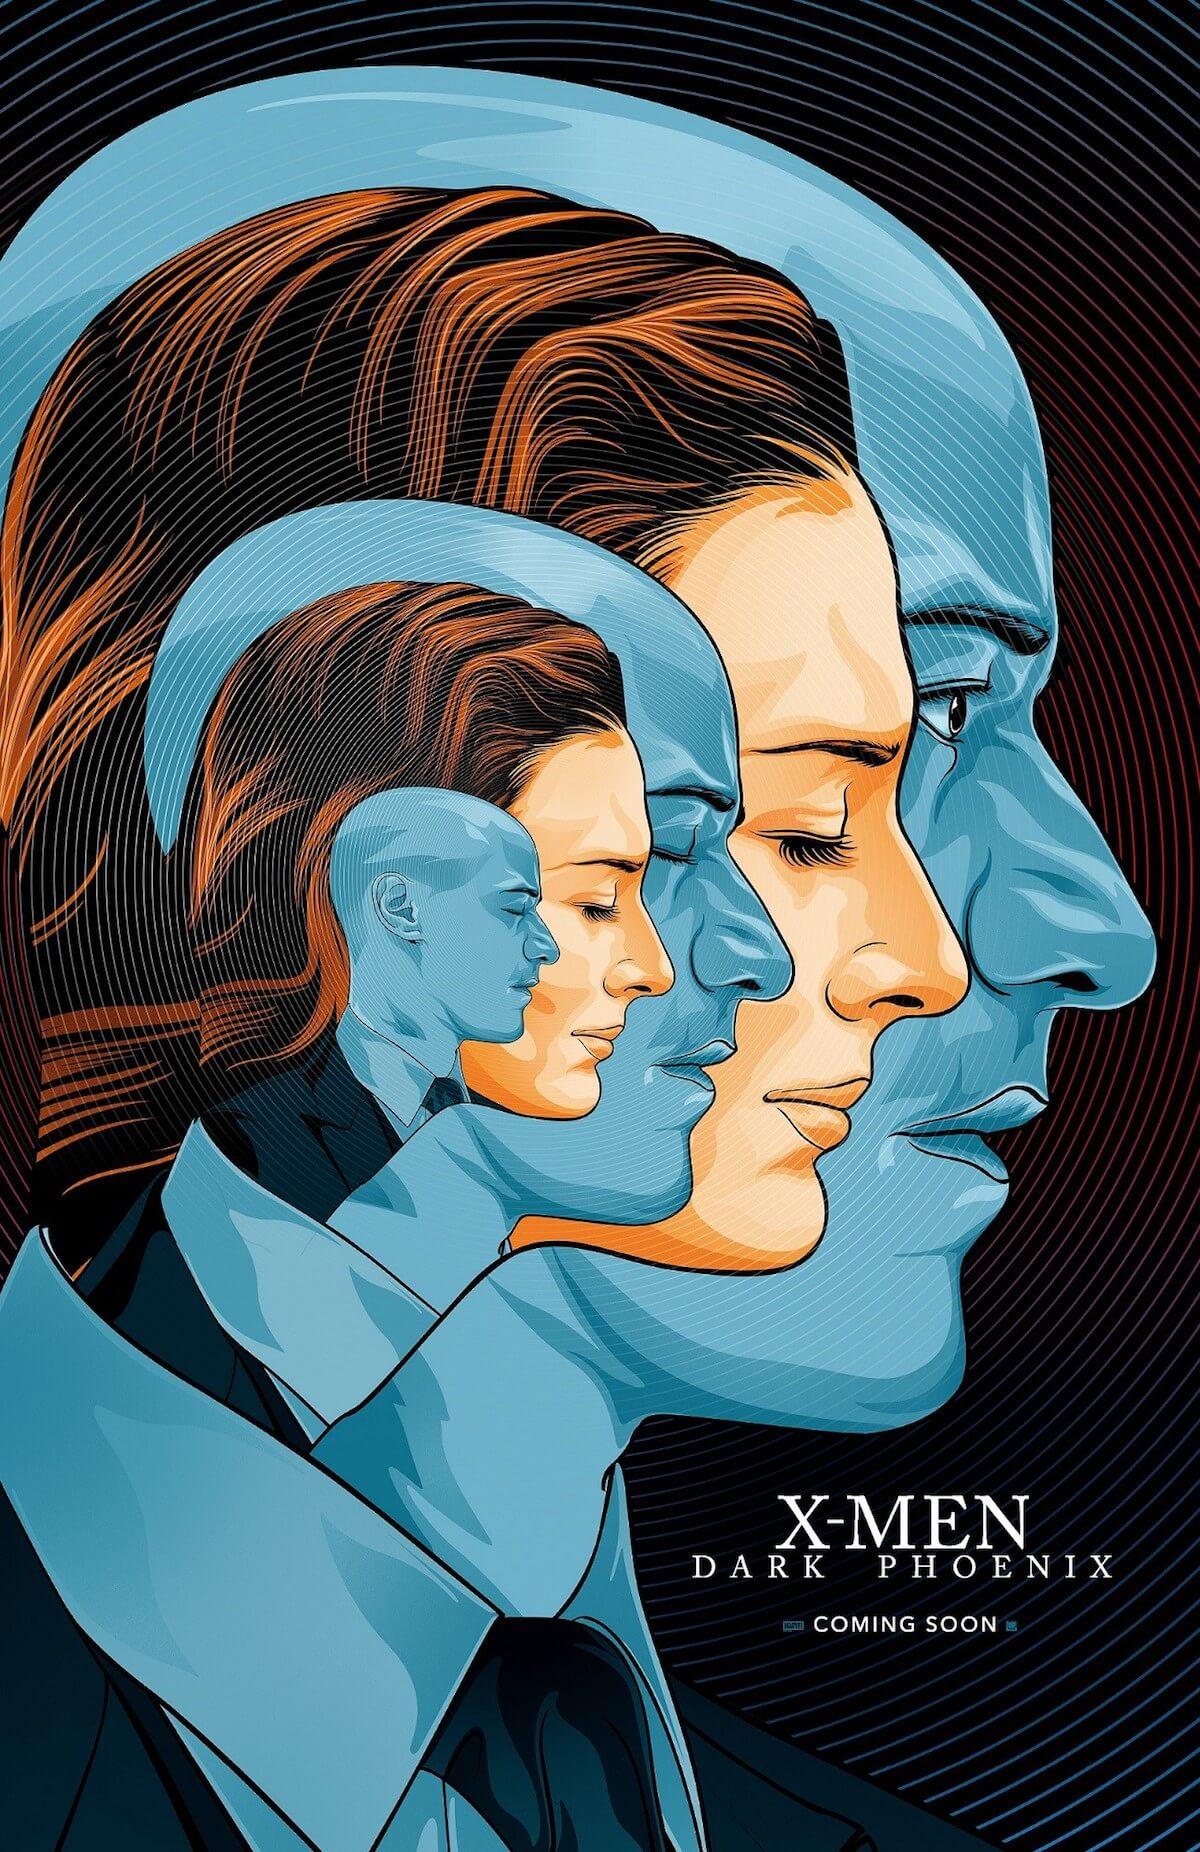 『X-MEN:ダーク・フェニックス』公開記念イベント<XーMEN DAY>が開催!ジーン役ソフィー・ターナーの特別映像解禁 film190517_xmenday_3